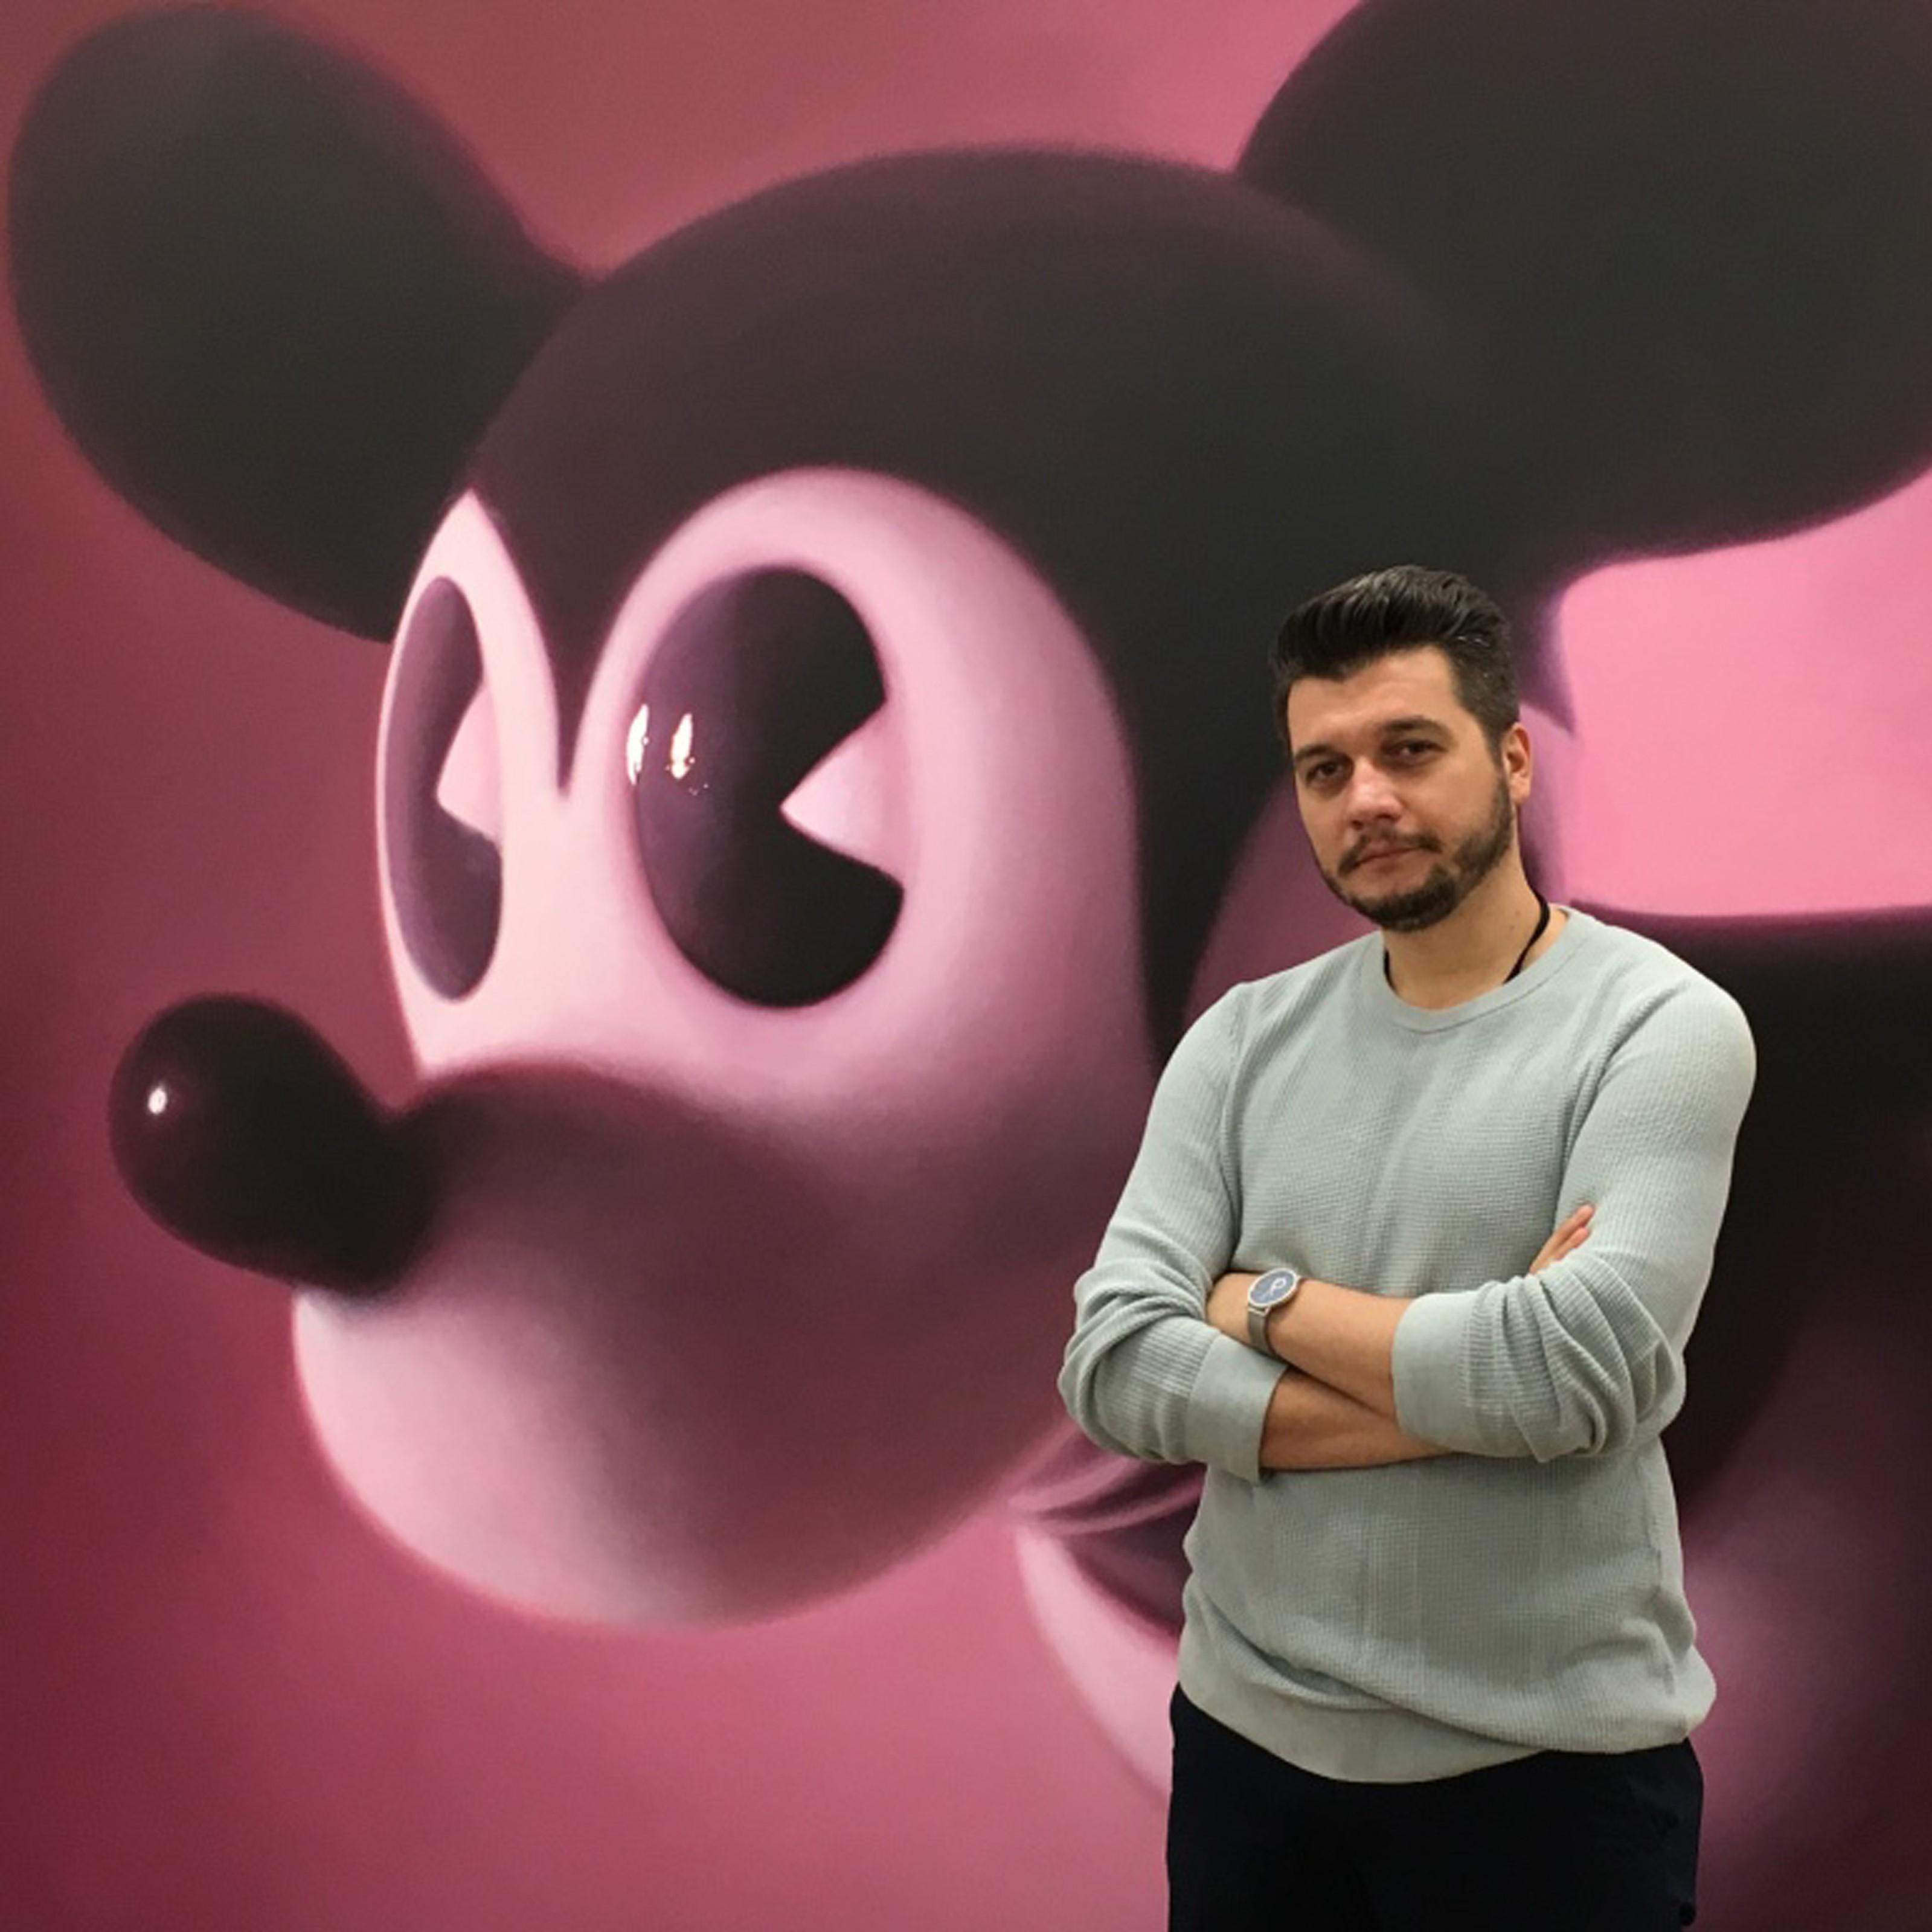 Mihai Zgondoiu în spate Mickey Mouse de Gottfried Helnwein-patrat